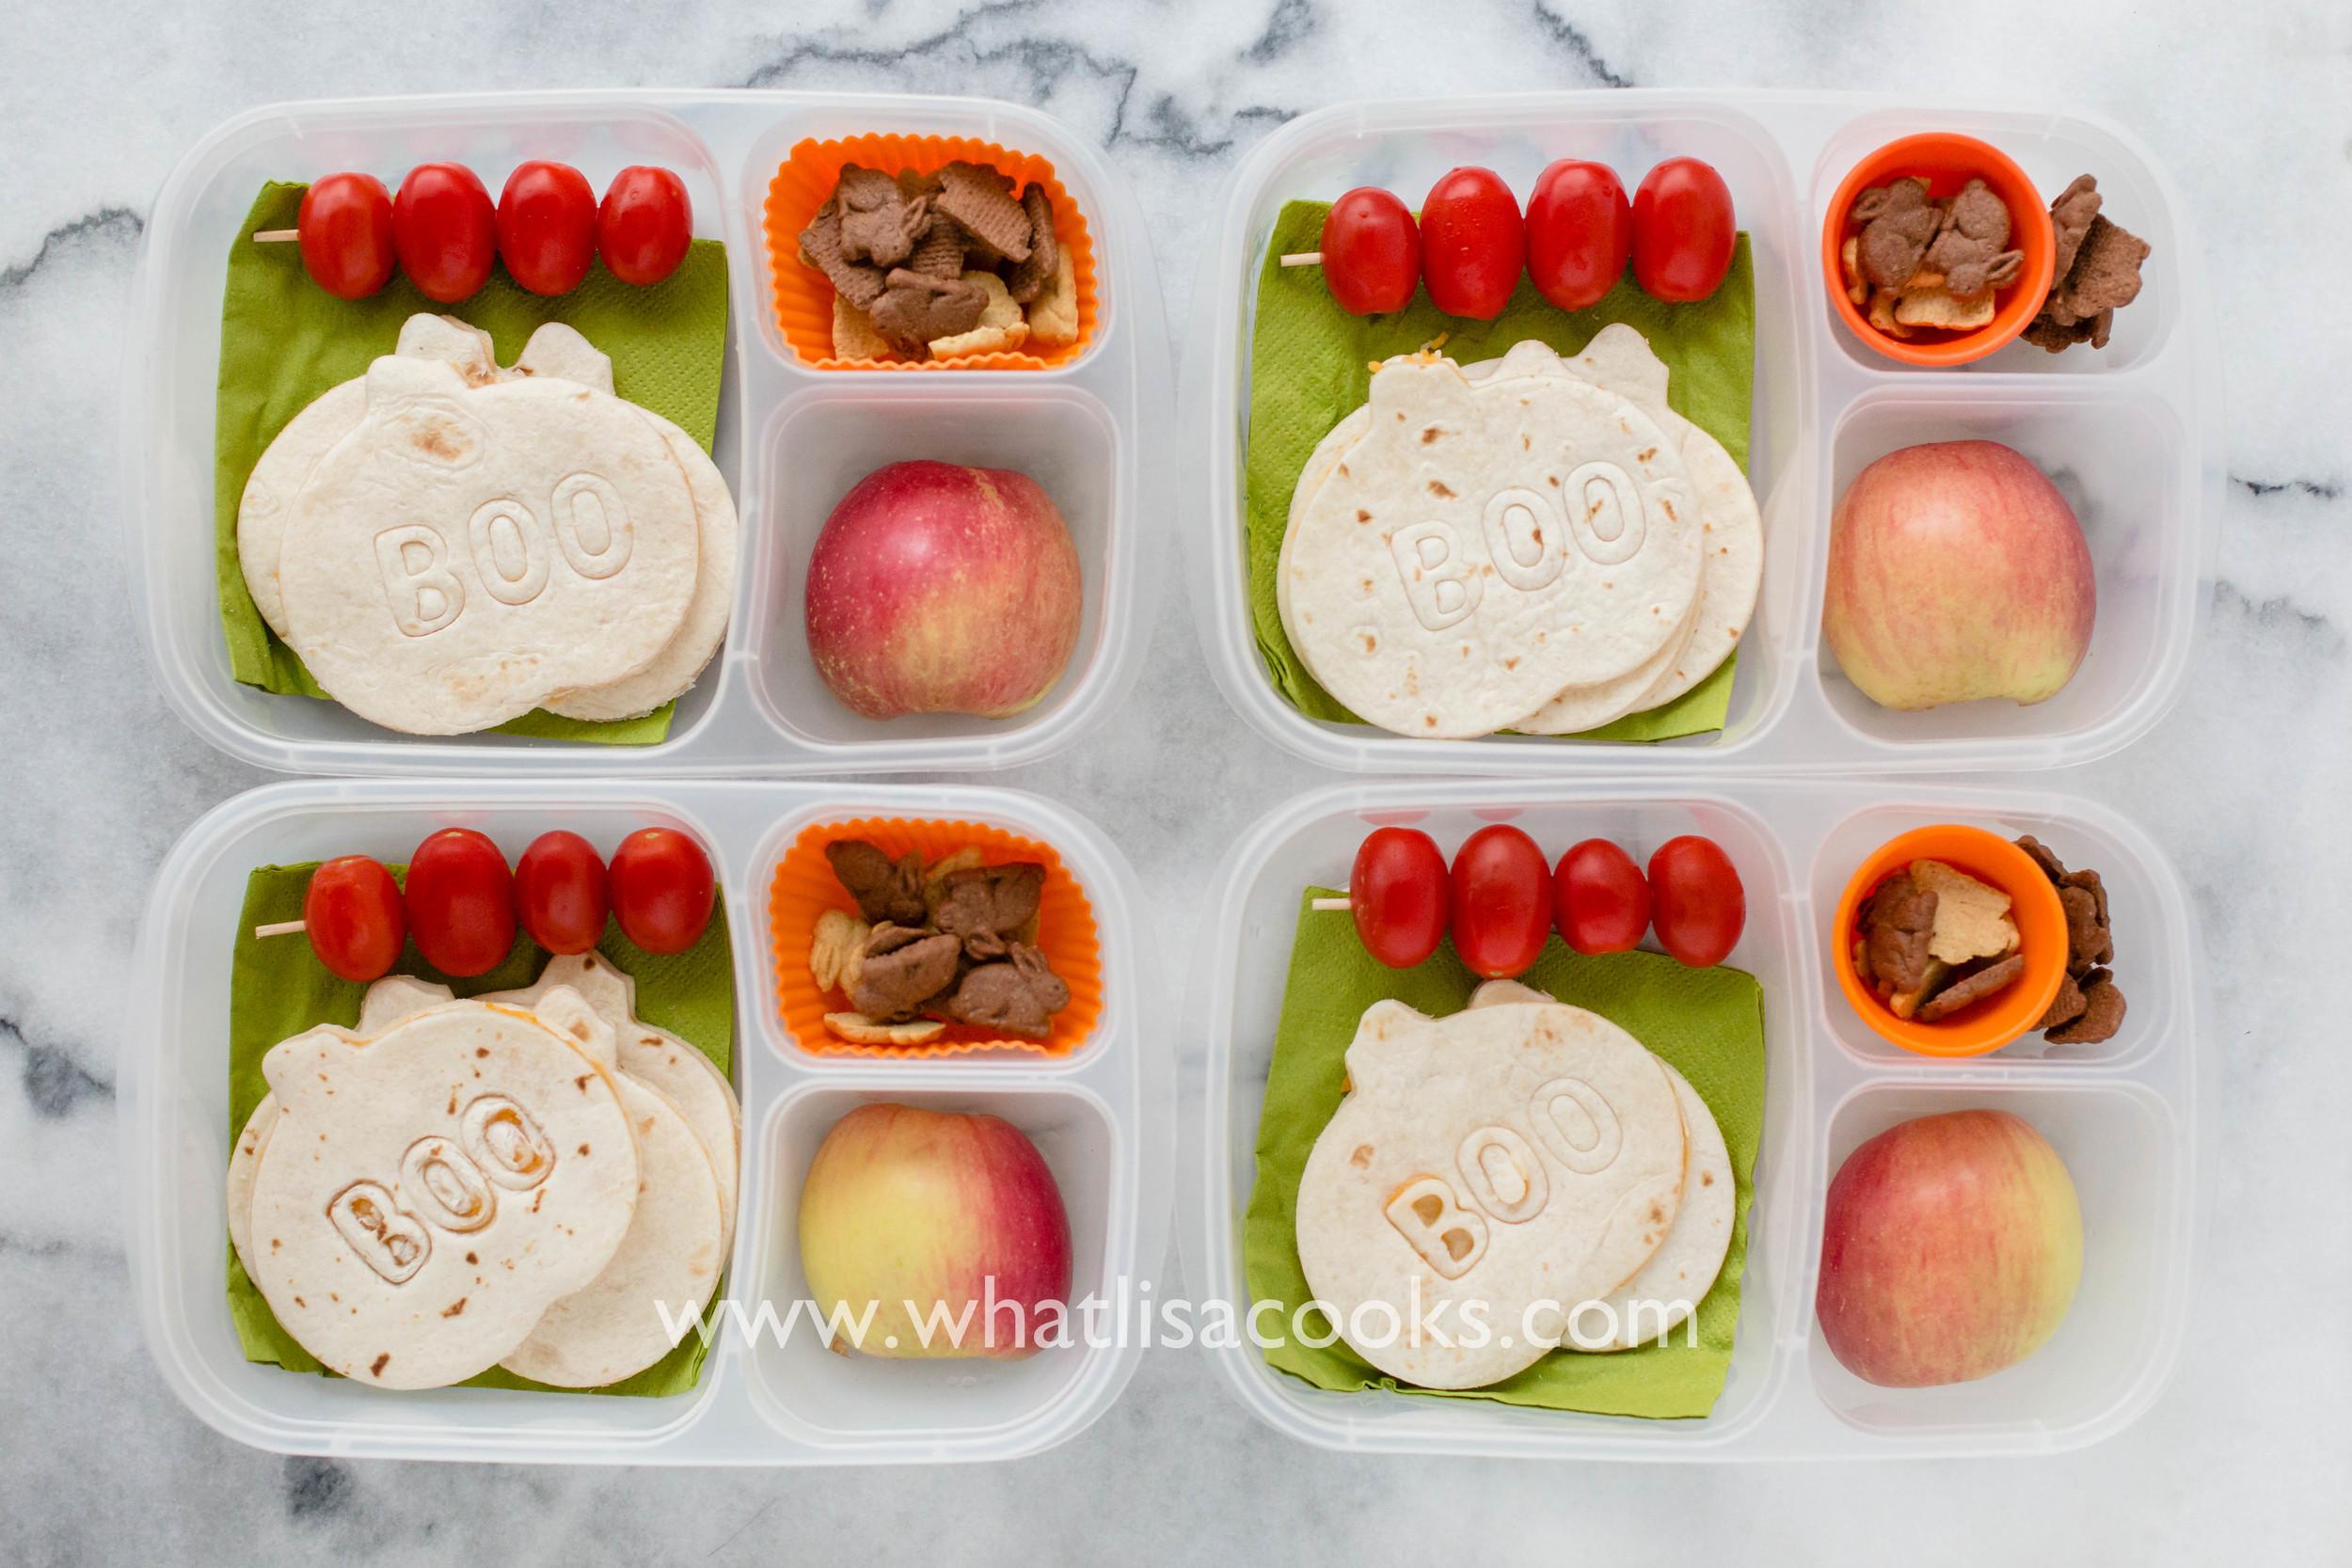 Easy Halloween School Lunch - pumpkin shaped quesadillas - from whatlisacooks.com